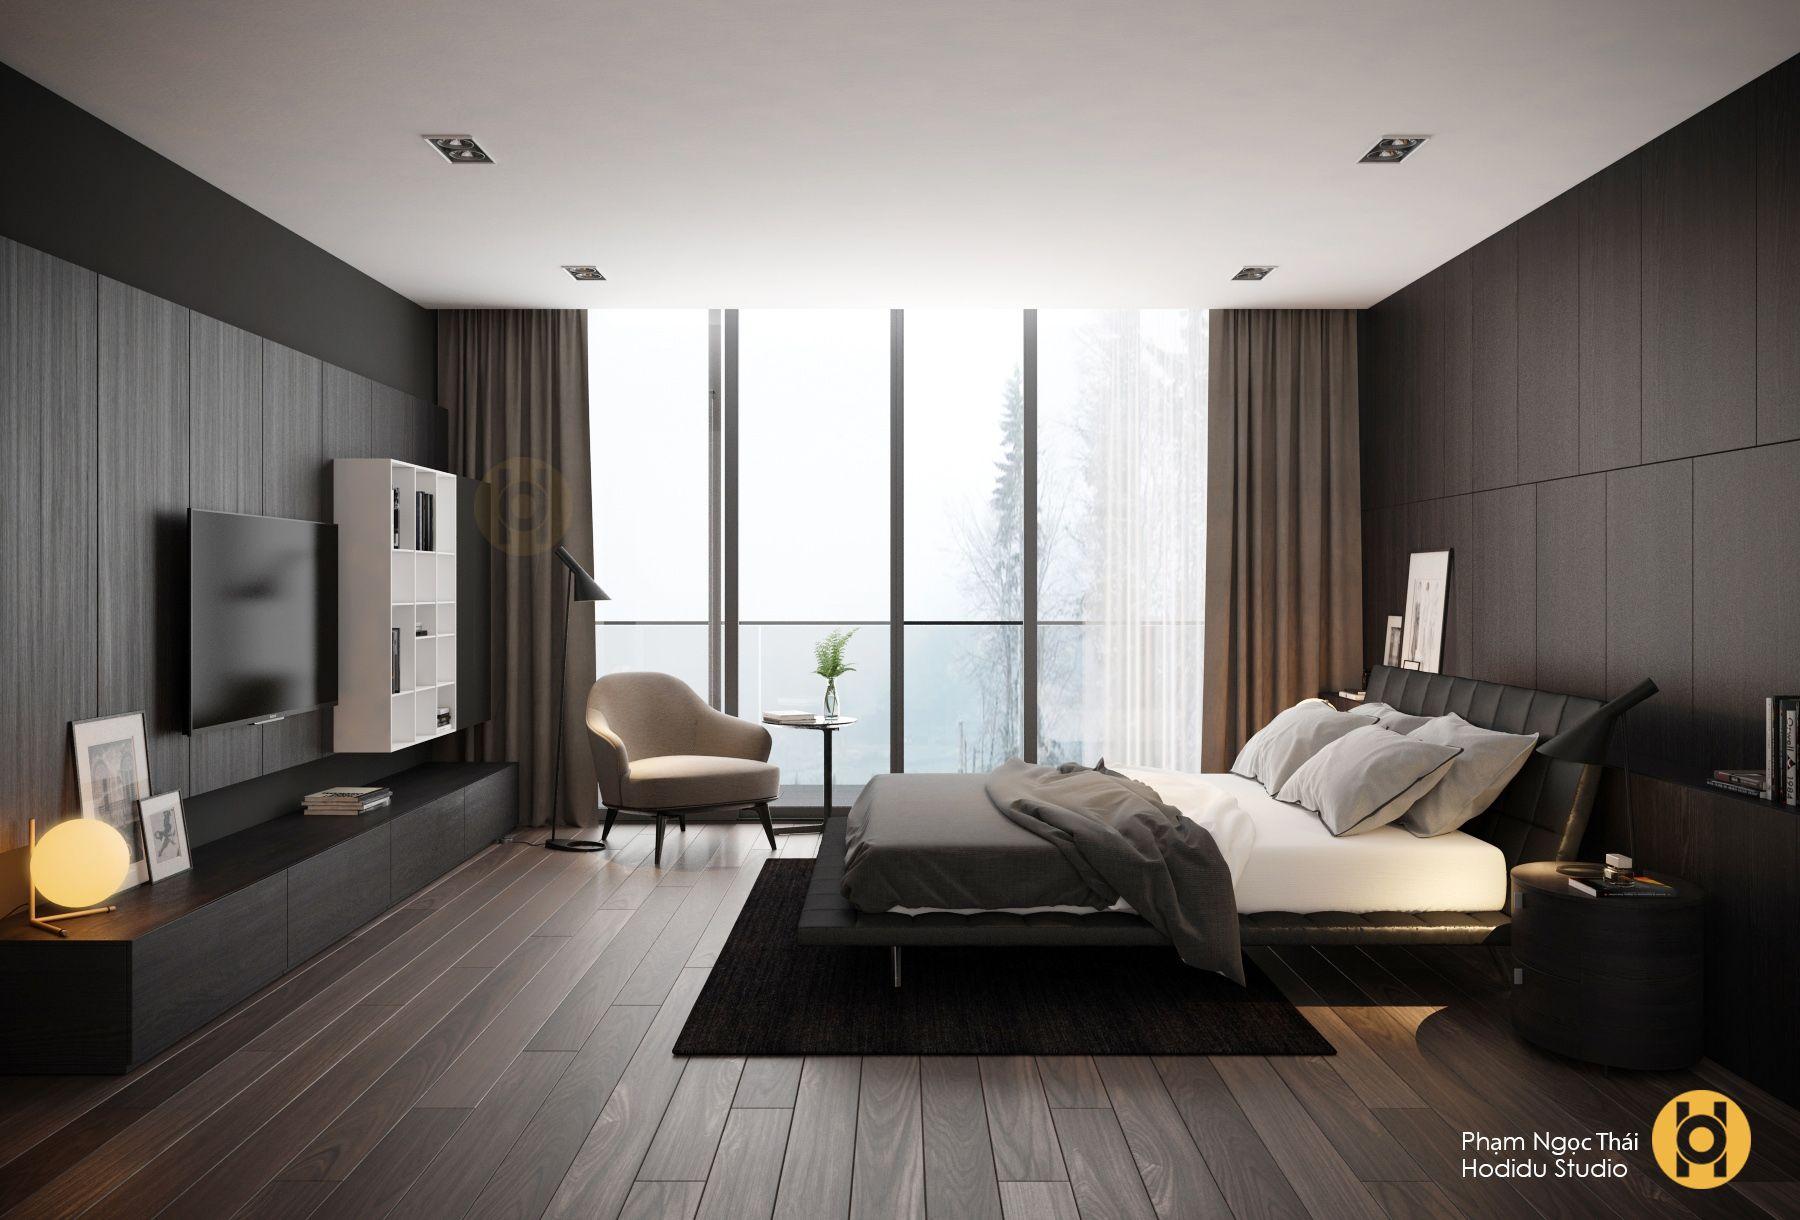 Best Vrayworld Poliform Style ไอเดียห้องนอน ดีไซน์ห้องนอน 400 x 300